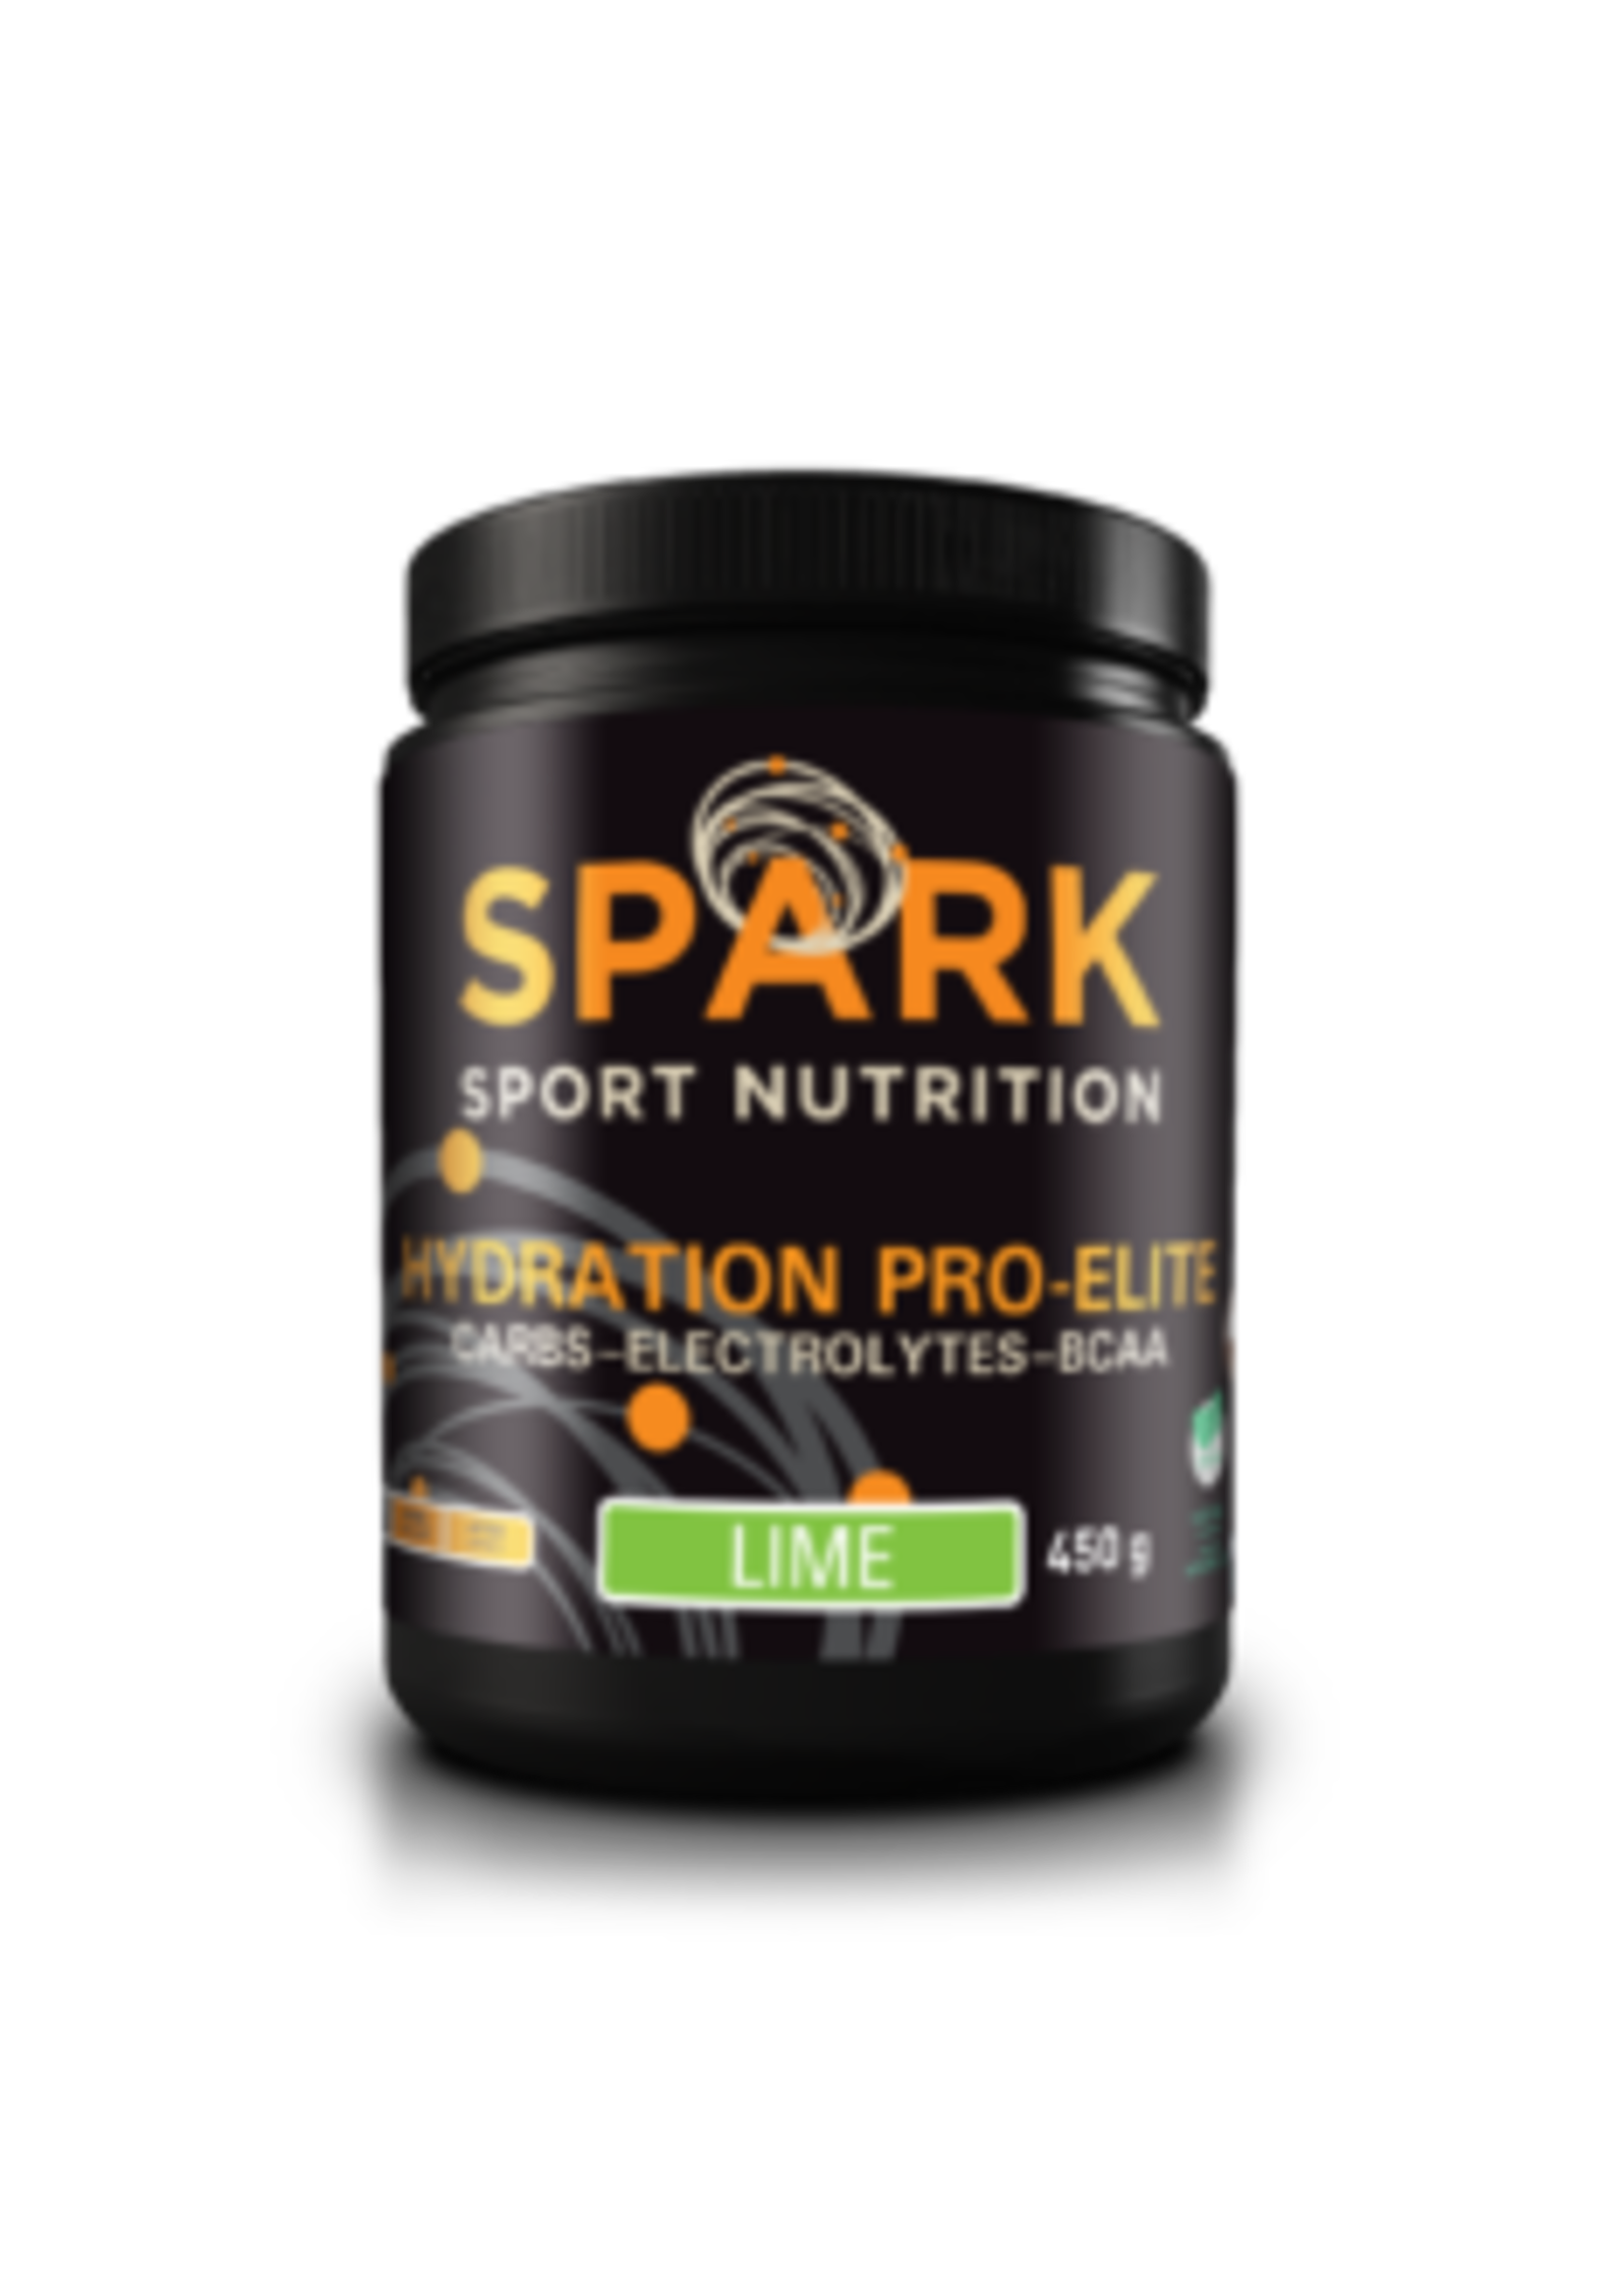 spark Spark Hydration Pro-Elite (Cafeine) 450gr